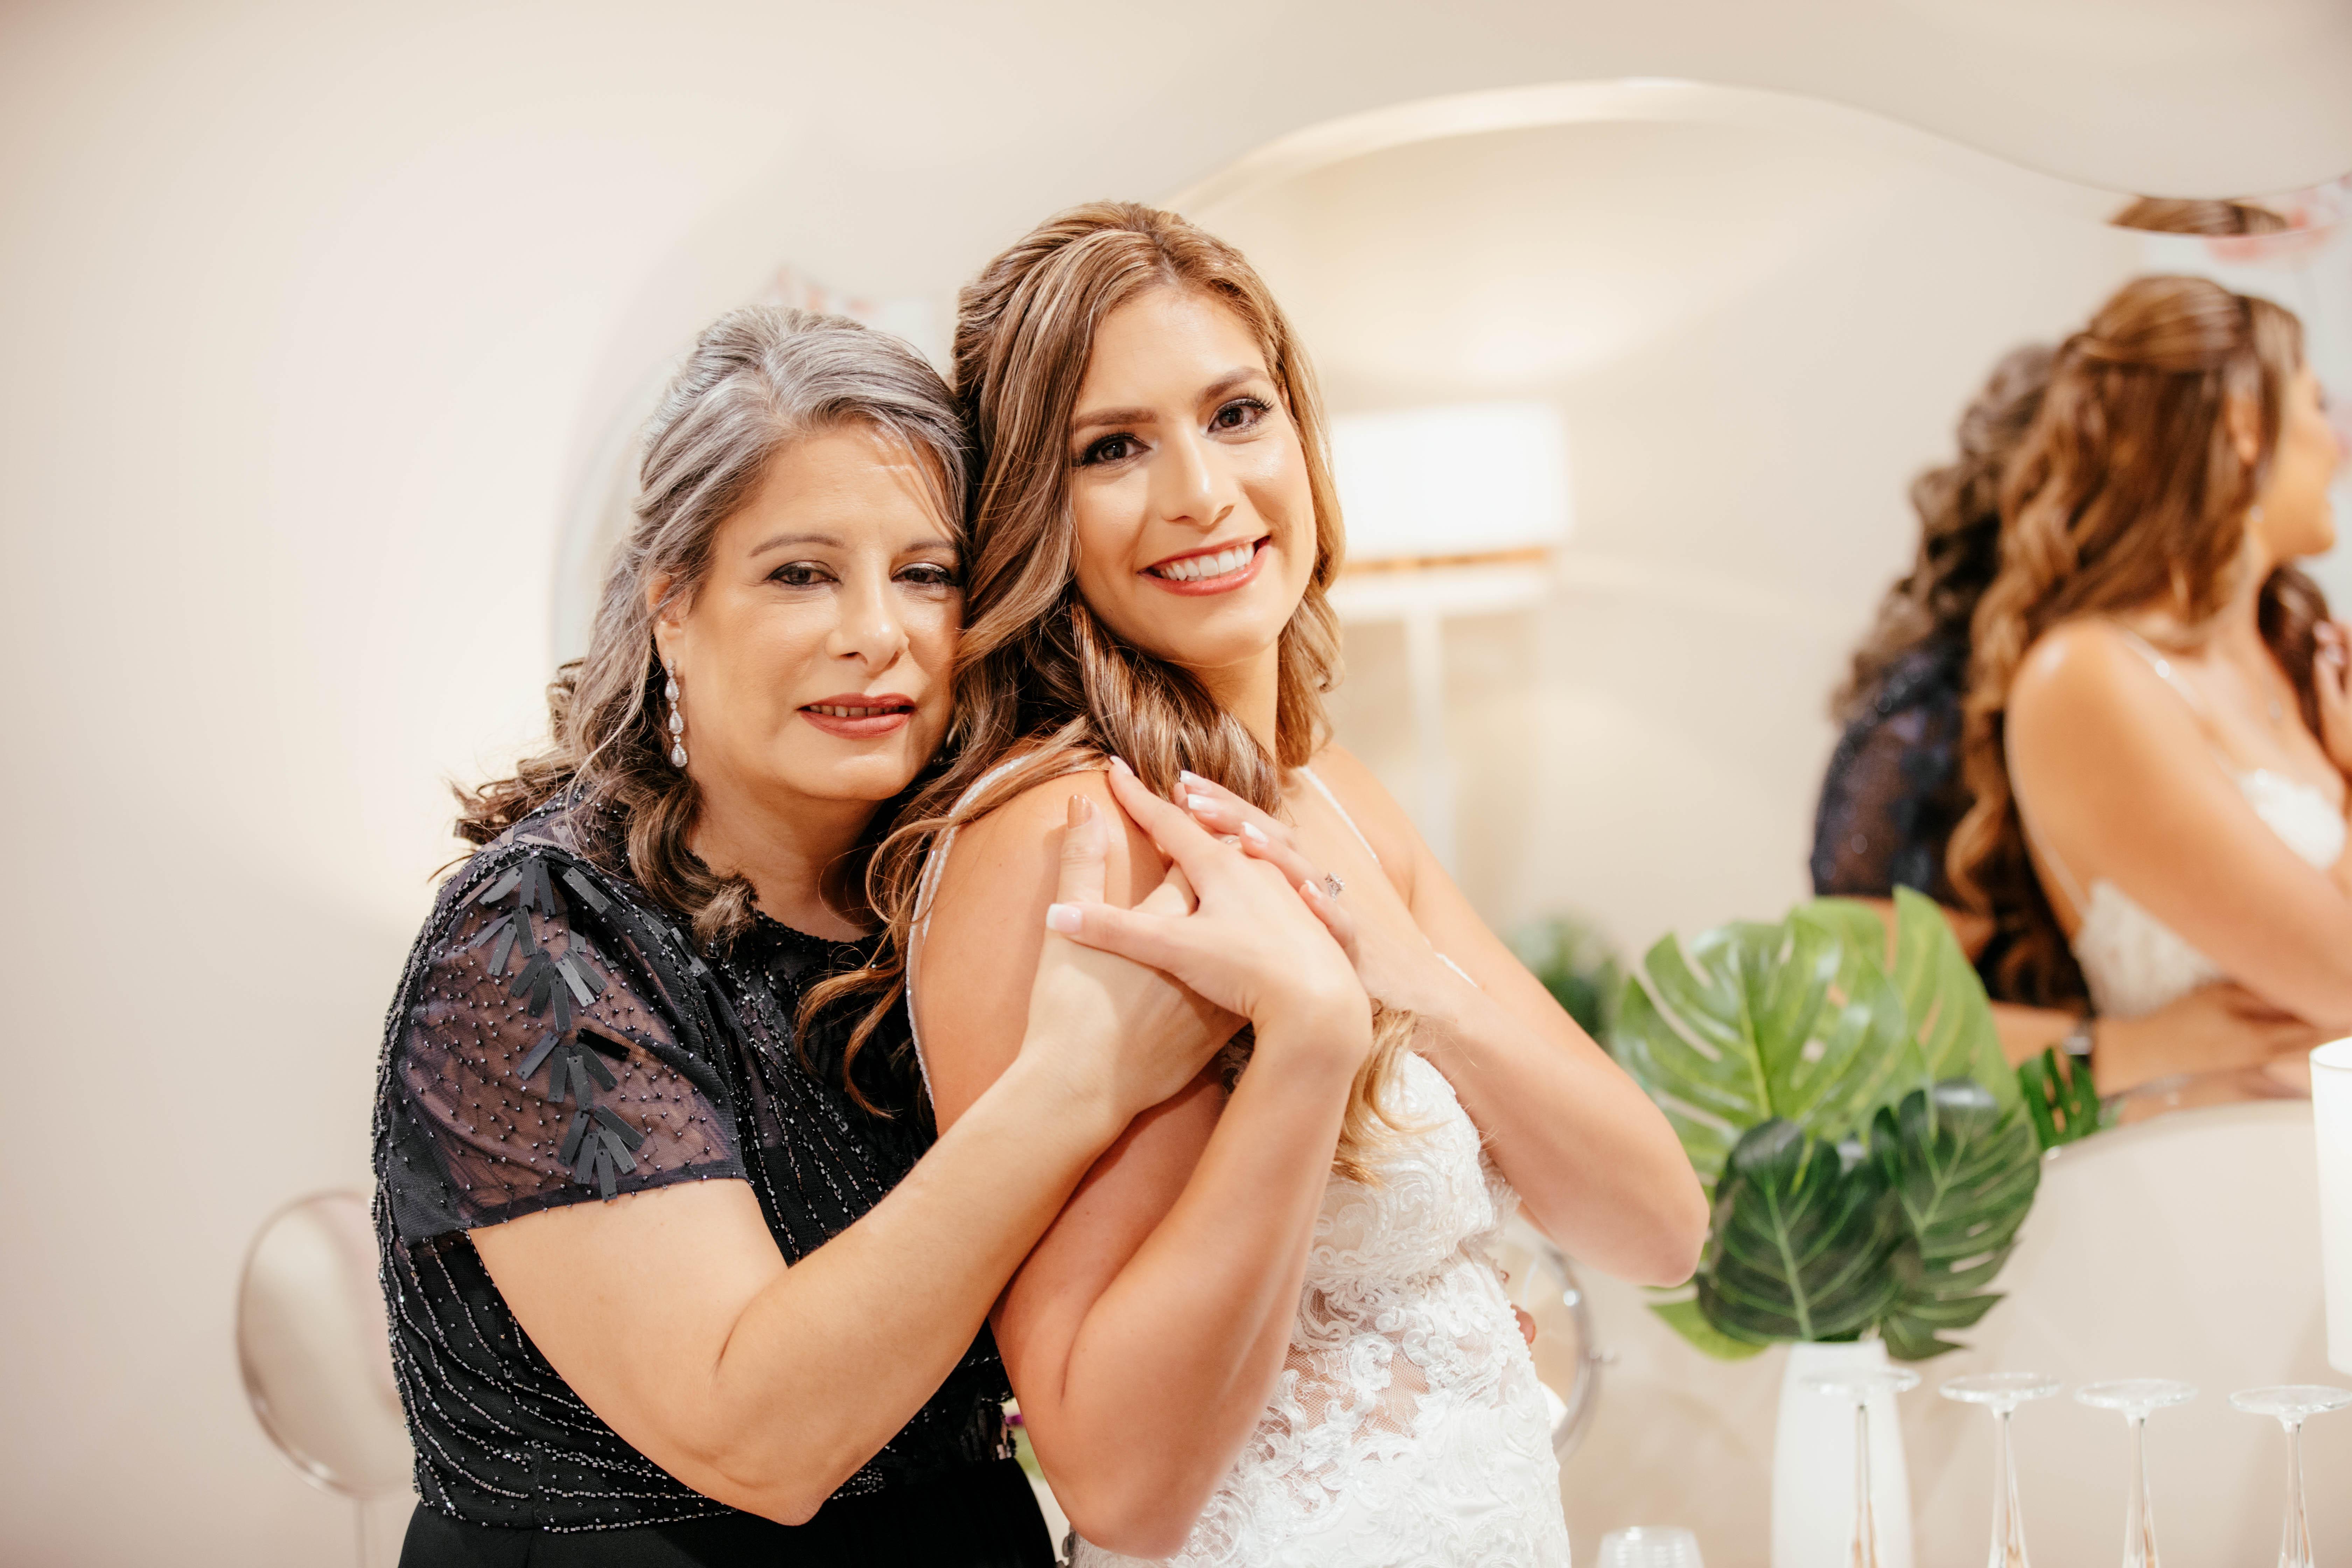 ROSINA-DIBELLO-PHOTO-DEERCREEK-WEDDING-1